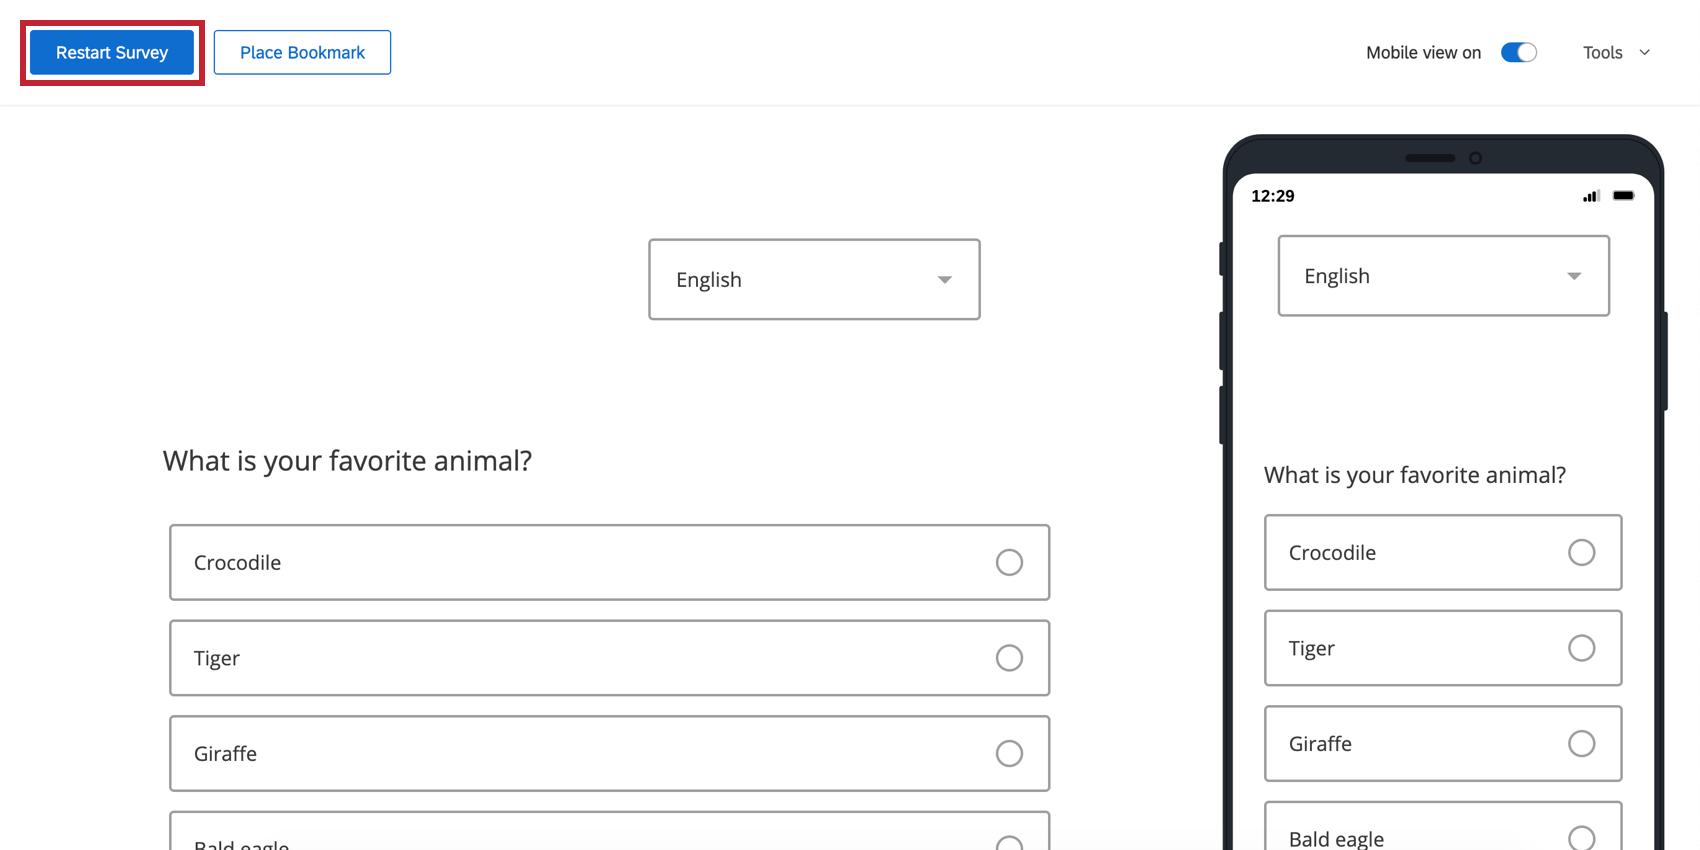 Blue Restart Survey button on upper-left